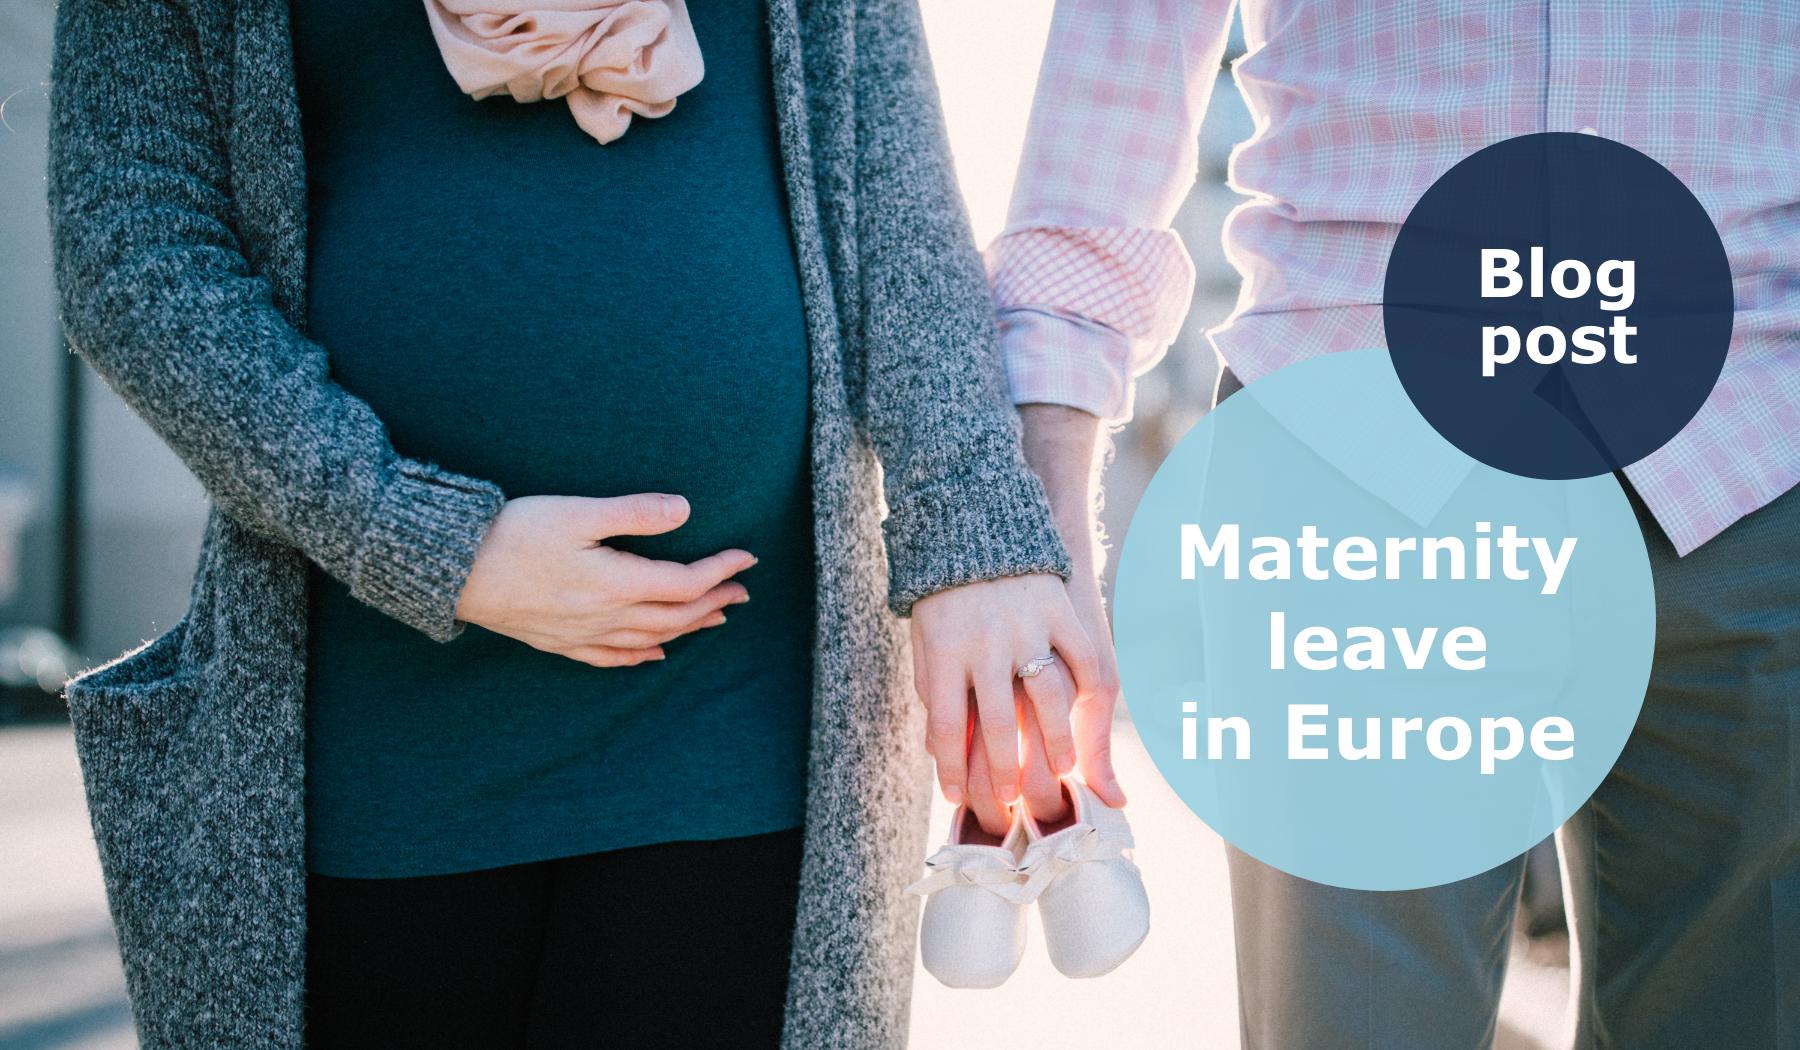 Maternity leave Europe